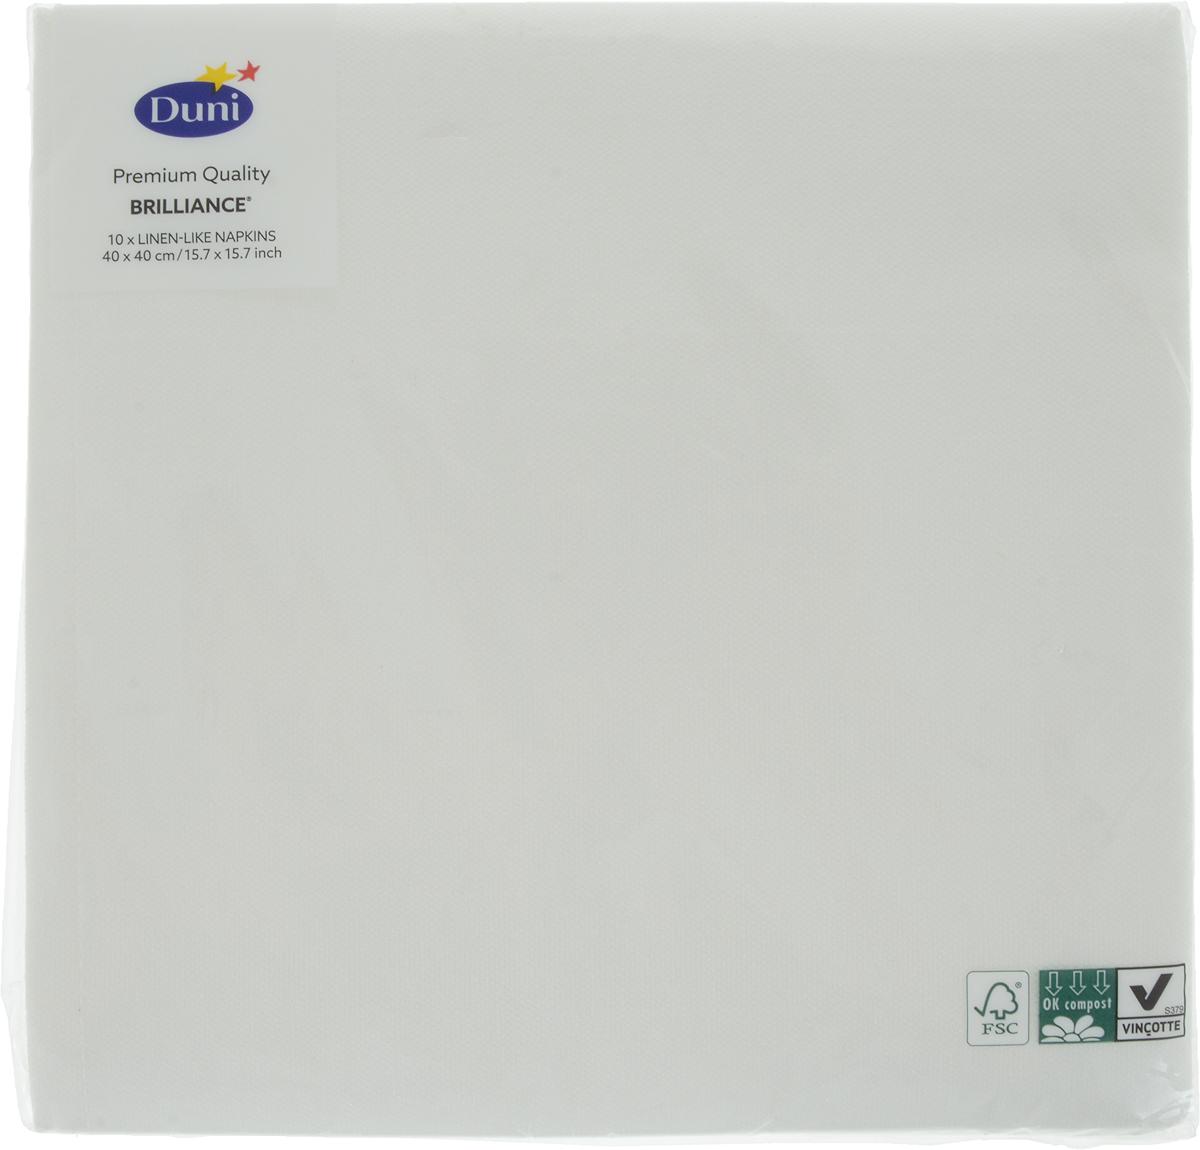 Салфетки бумажные Duni Lin. Brilliance, цвет: белый, 40 x 40 см салфетки duni салфетки d lin 40cm brilliance white